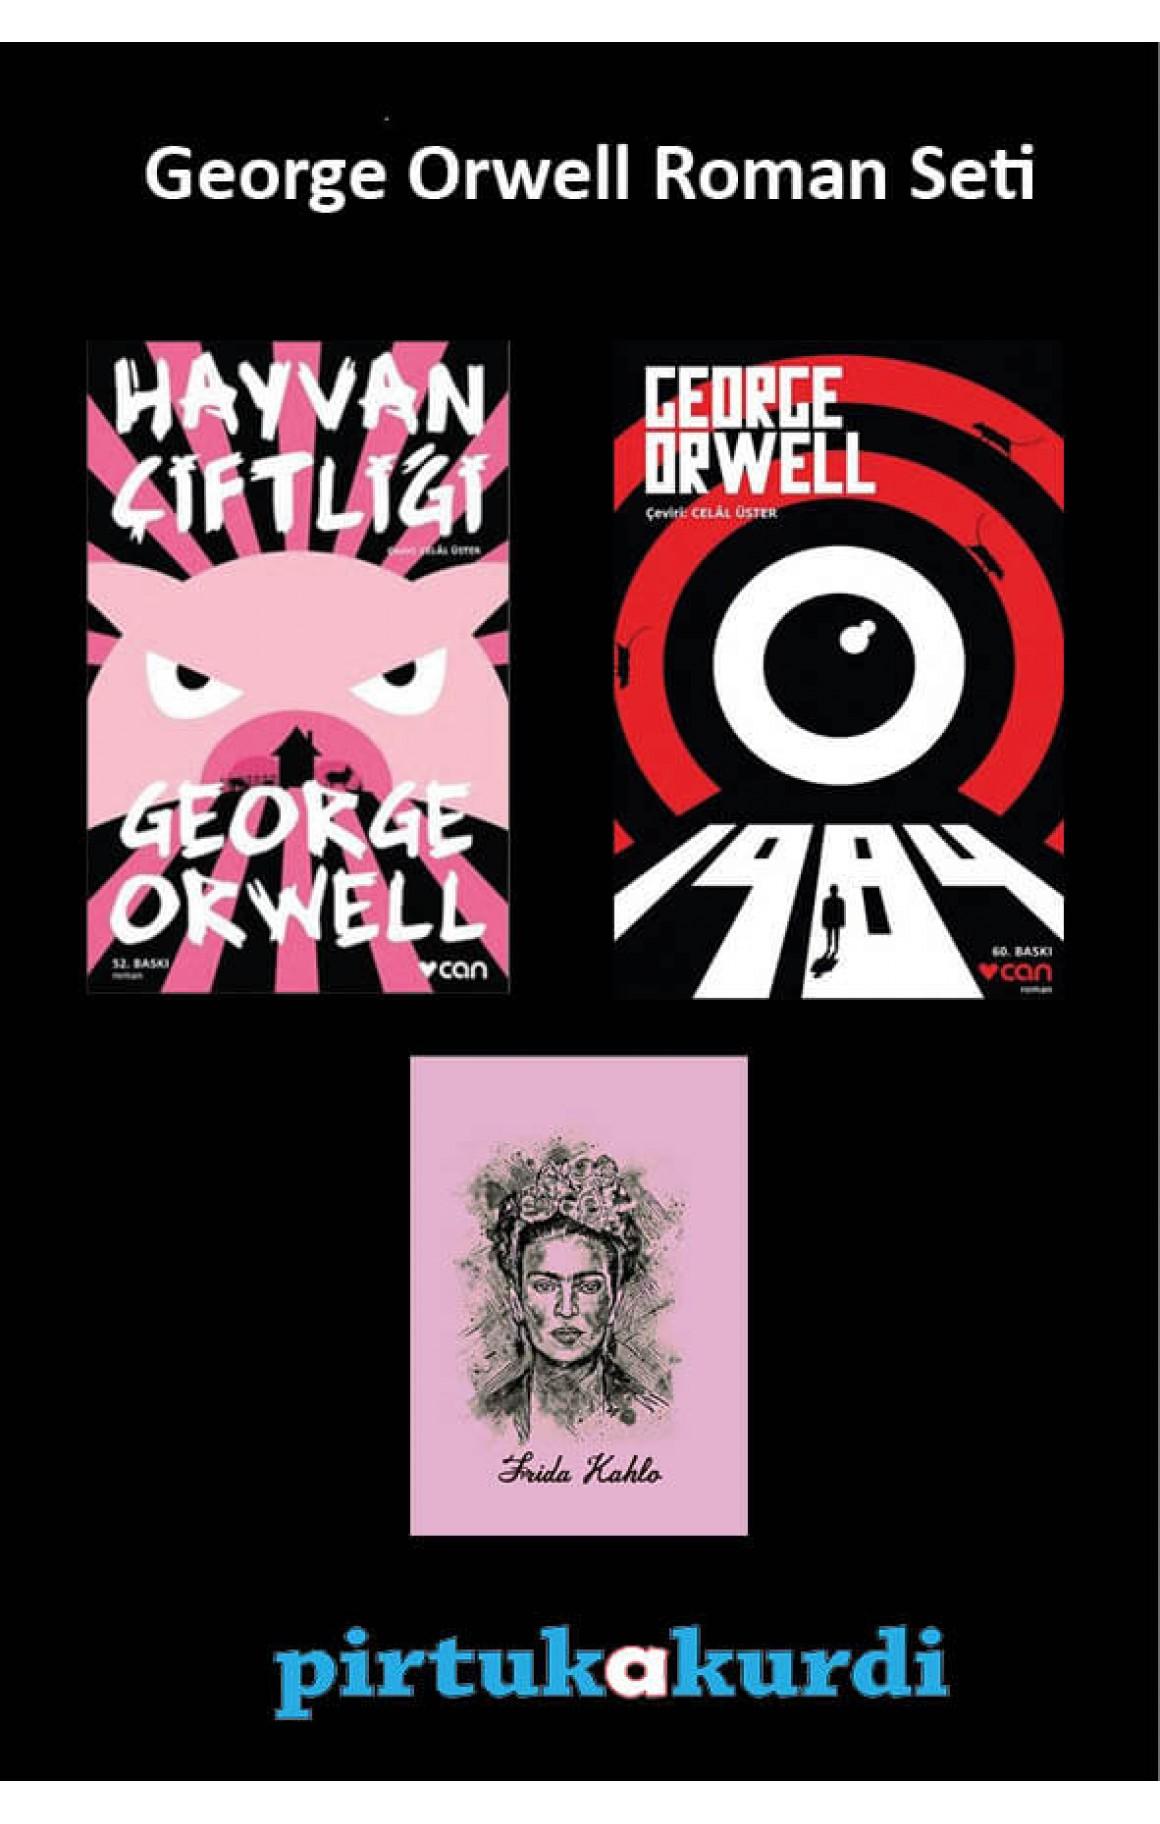 George Orwell Roman Seti